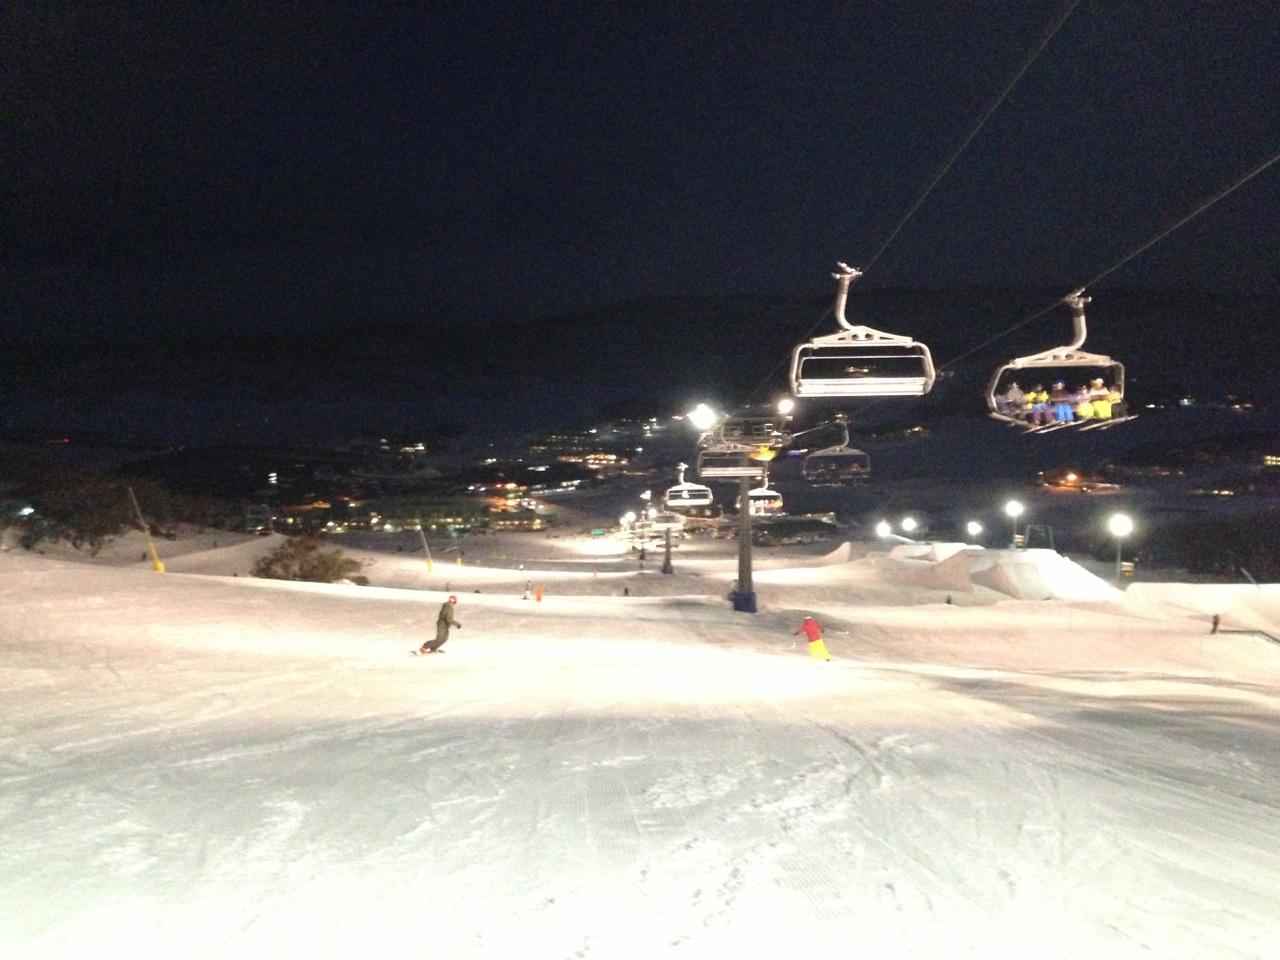 Having Fun Night Skiing